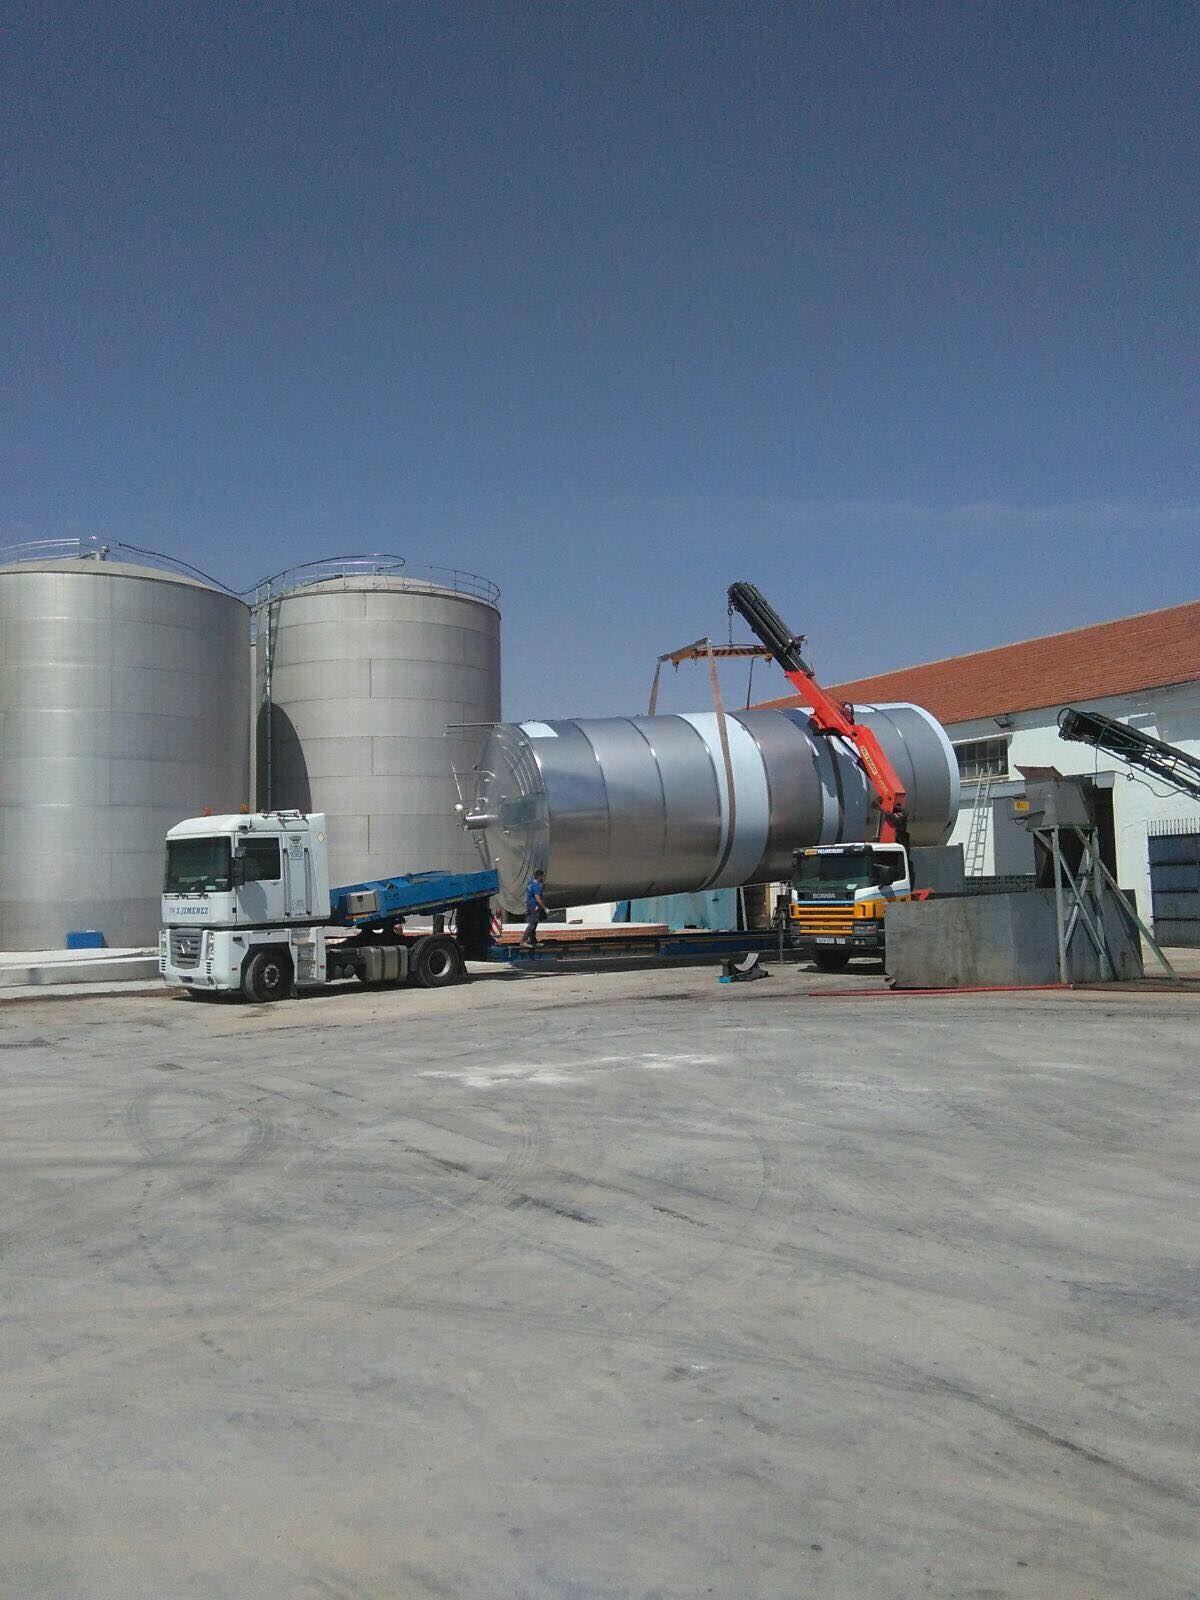 modernizacion bodegas san jose herencia 3 - Bodegas San José mejora y moderniza sus instalaciones